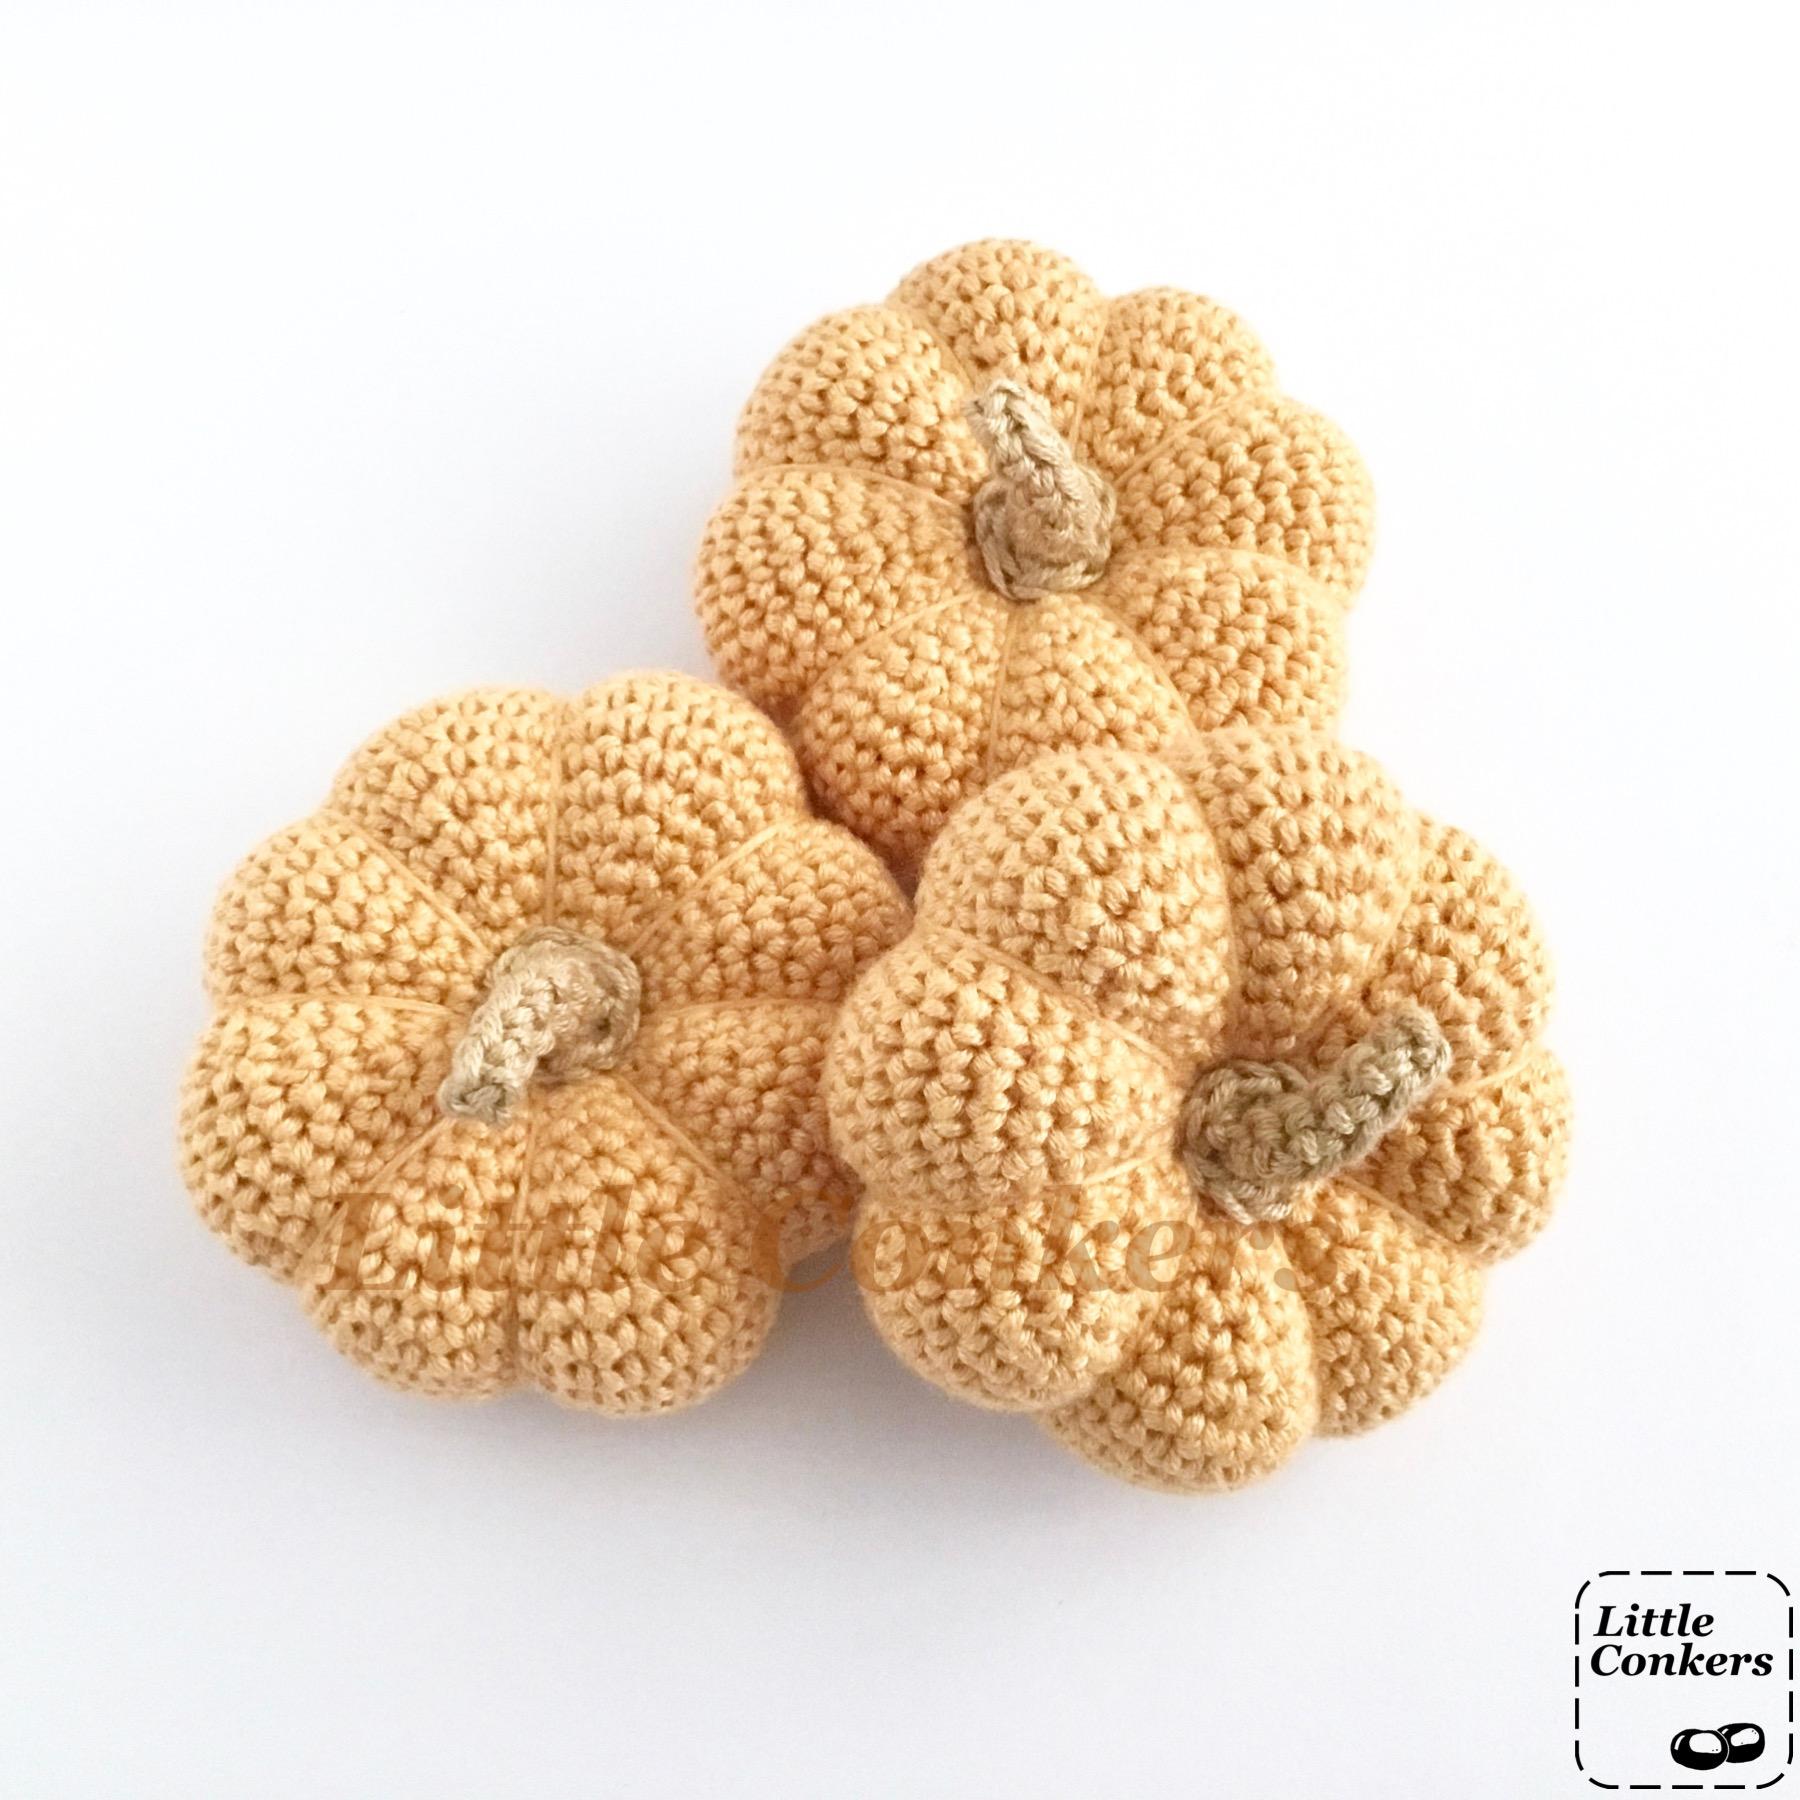 Crocheted Pale Orange Pumpkins